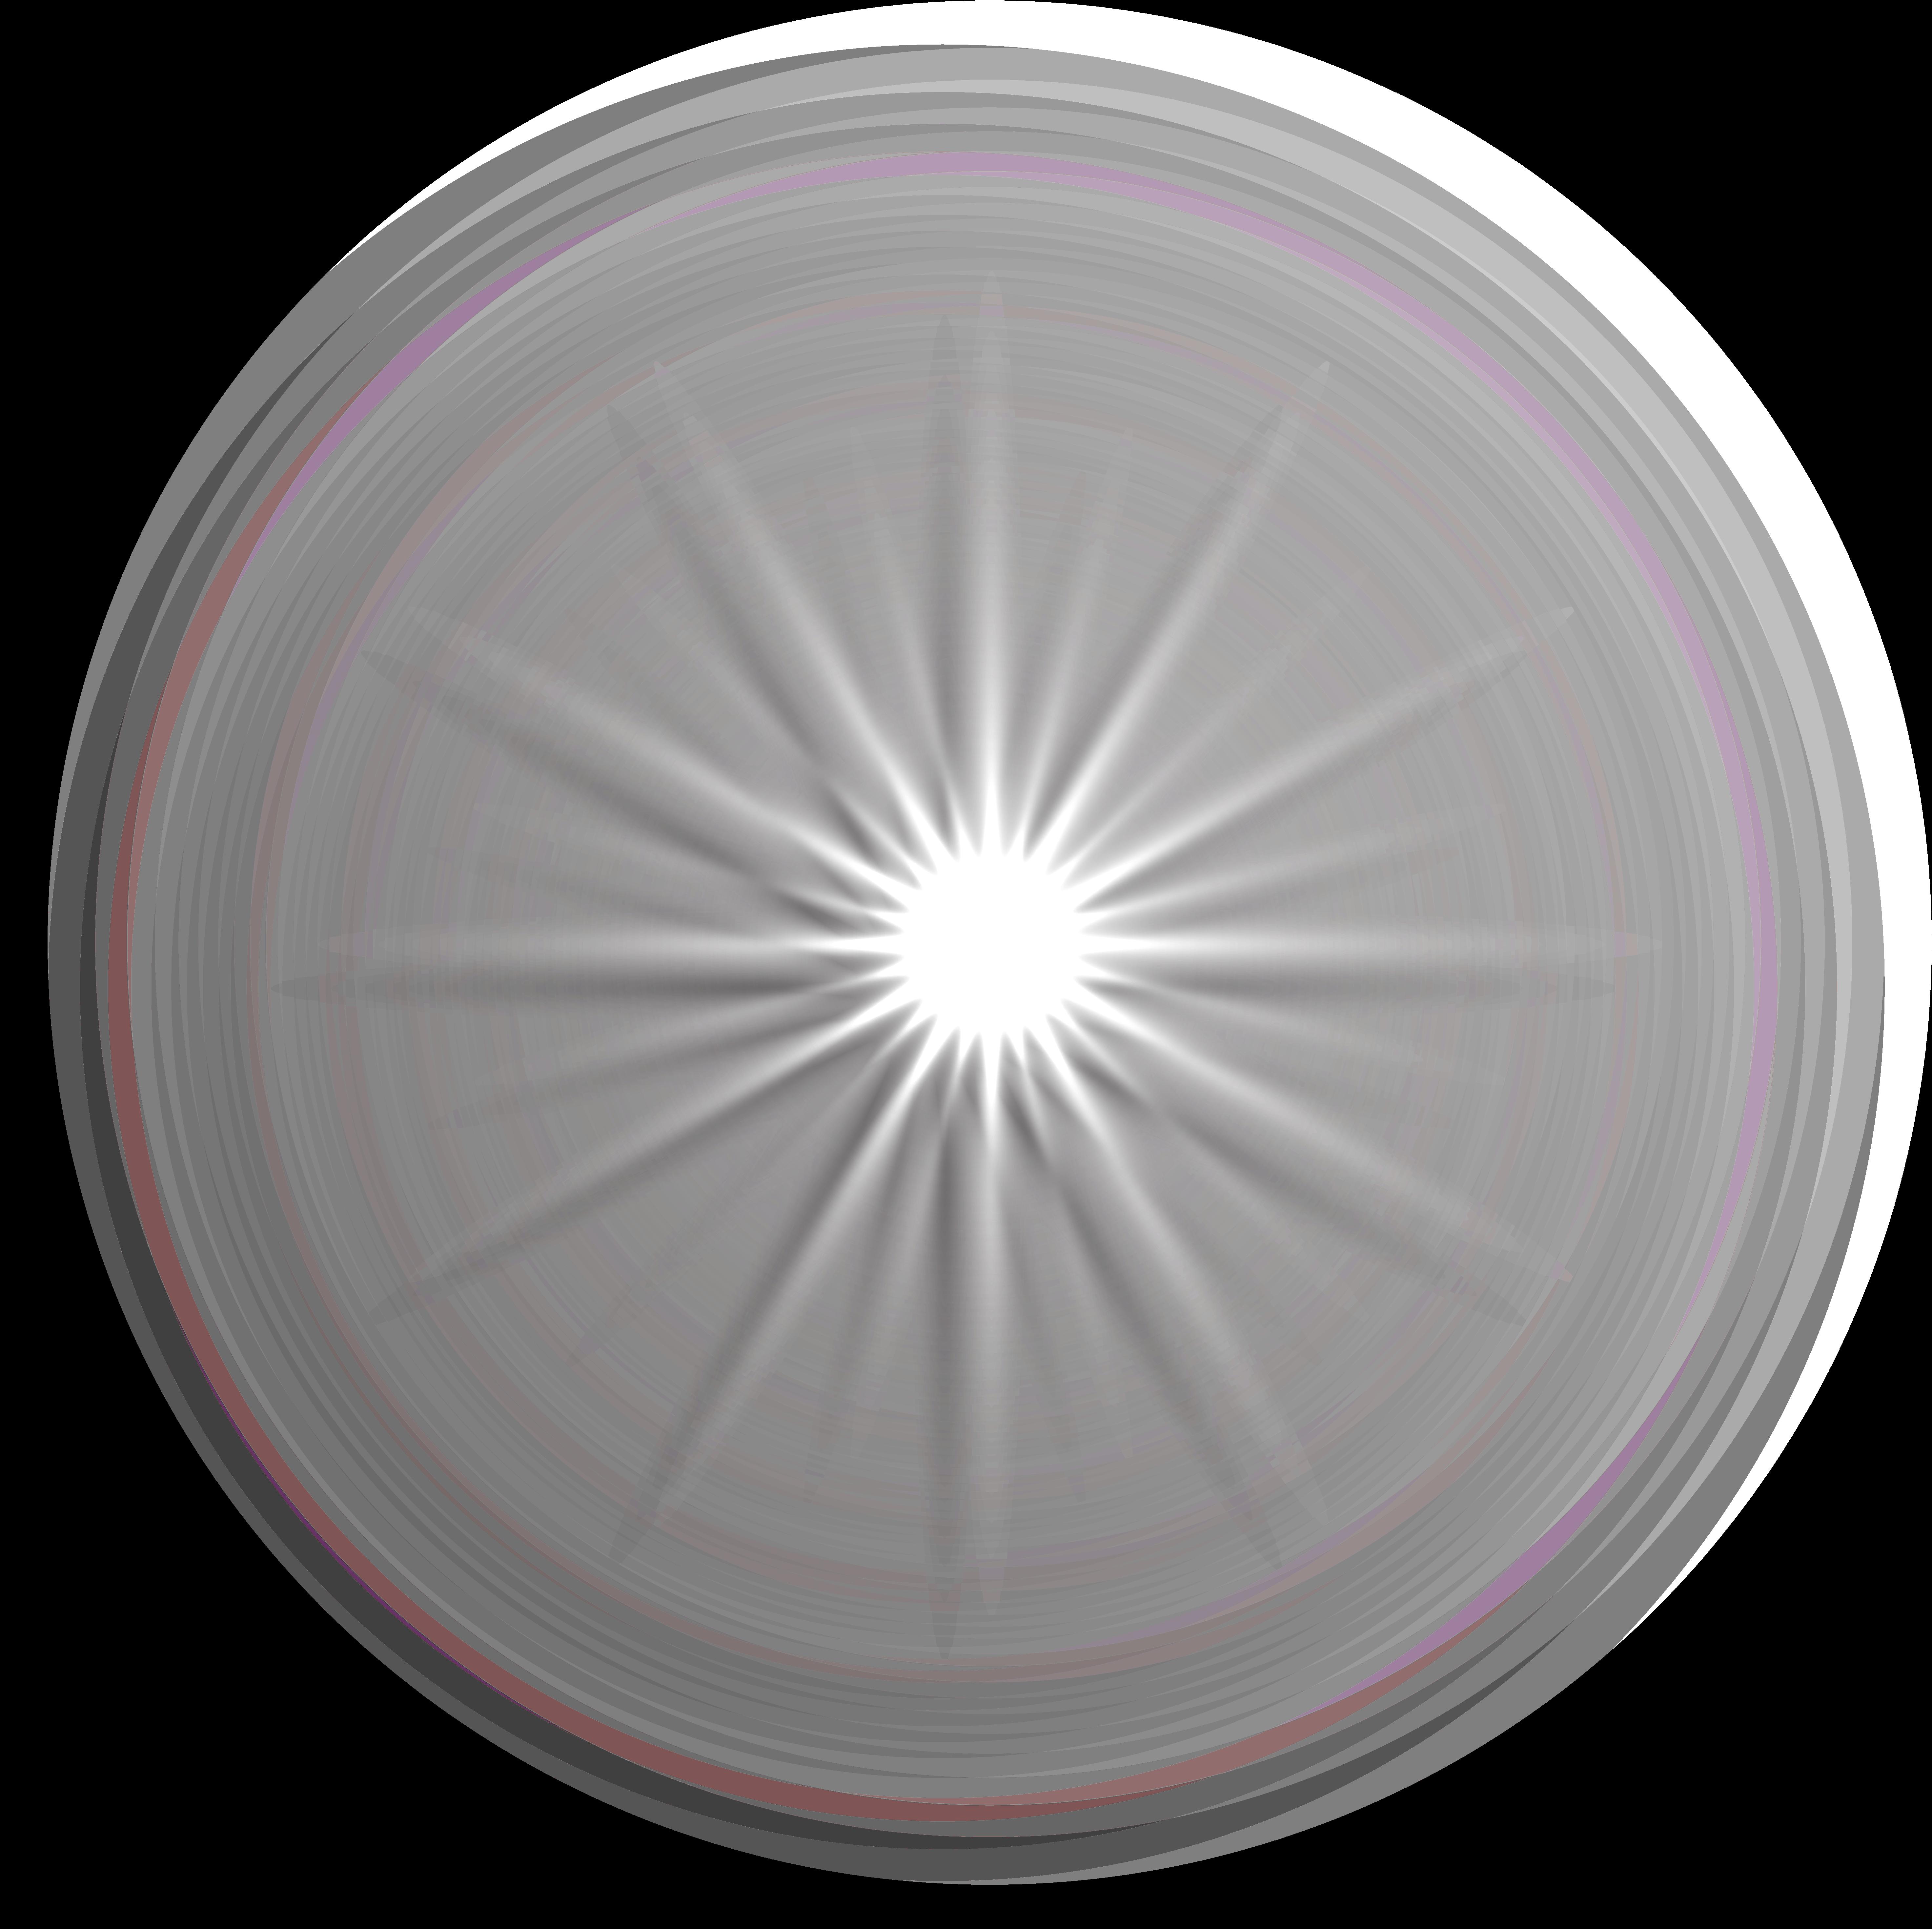 Shining Effect Png Circle.